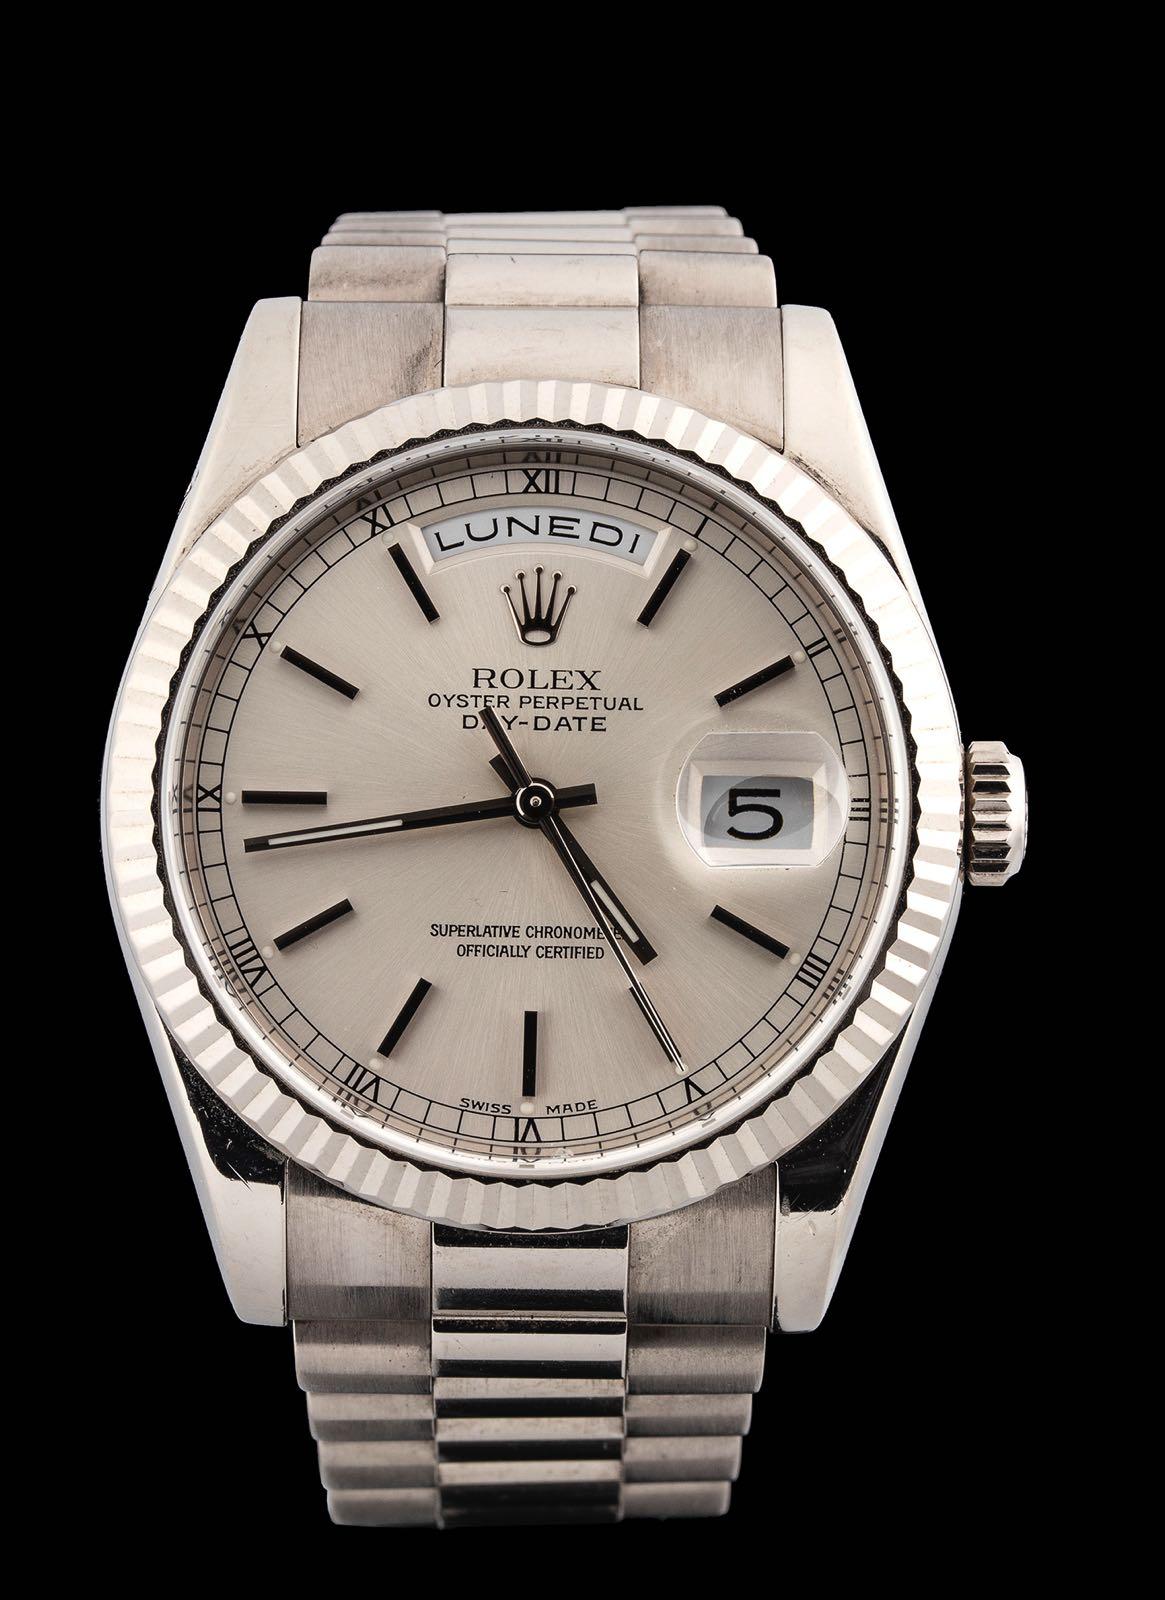 Rolex Day date ref 18039 white gold